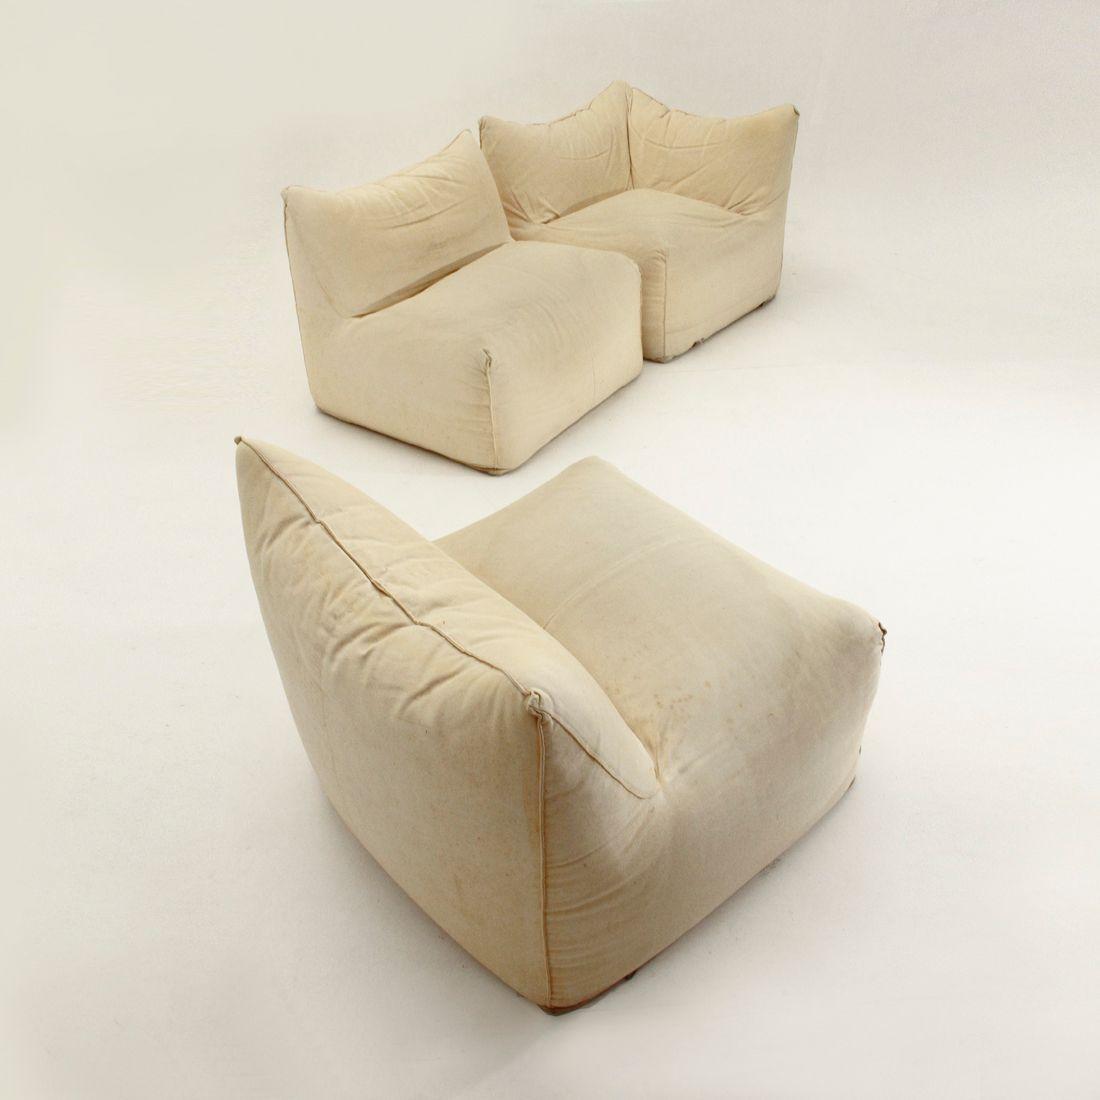 Le Bambole Modular Sofa By Mario Bellini For B B Italia 1970s For Sale At Pamono